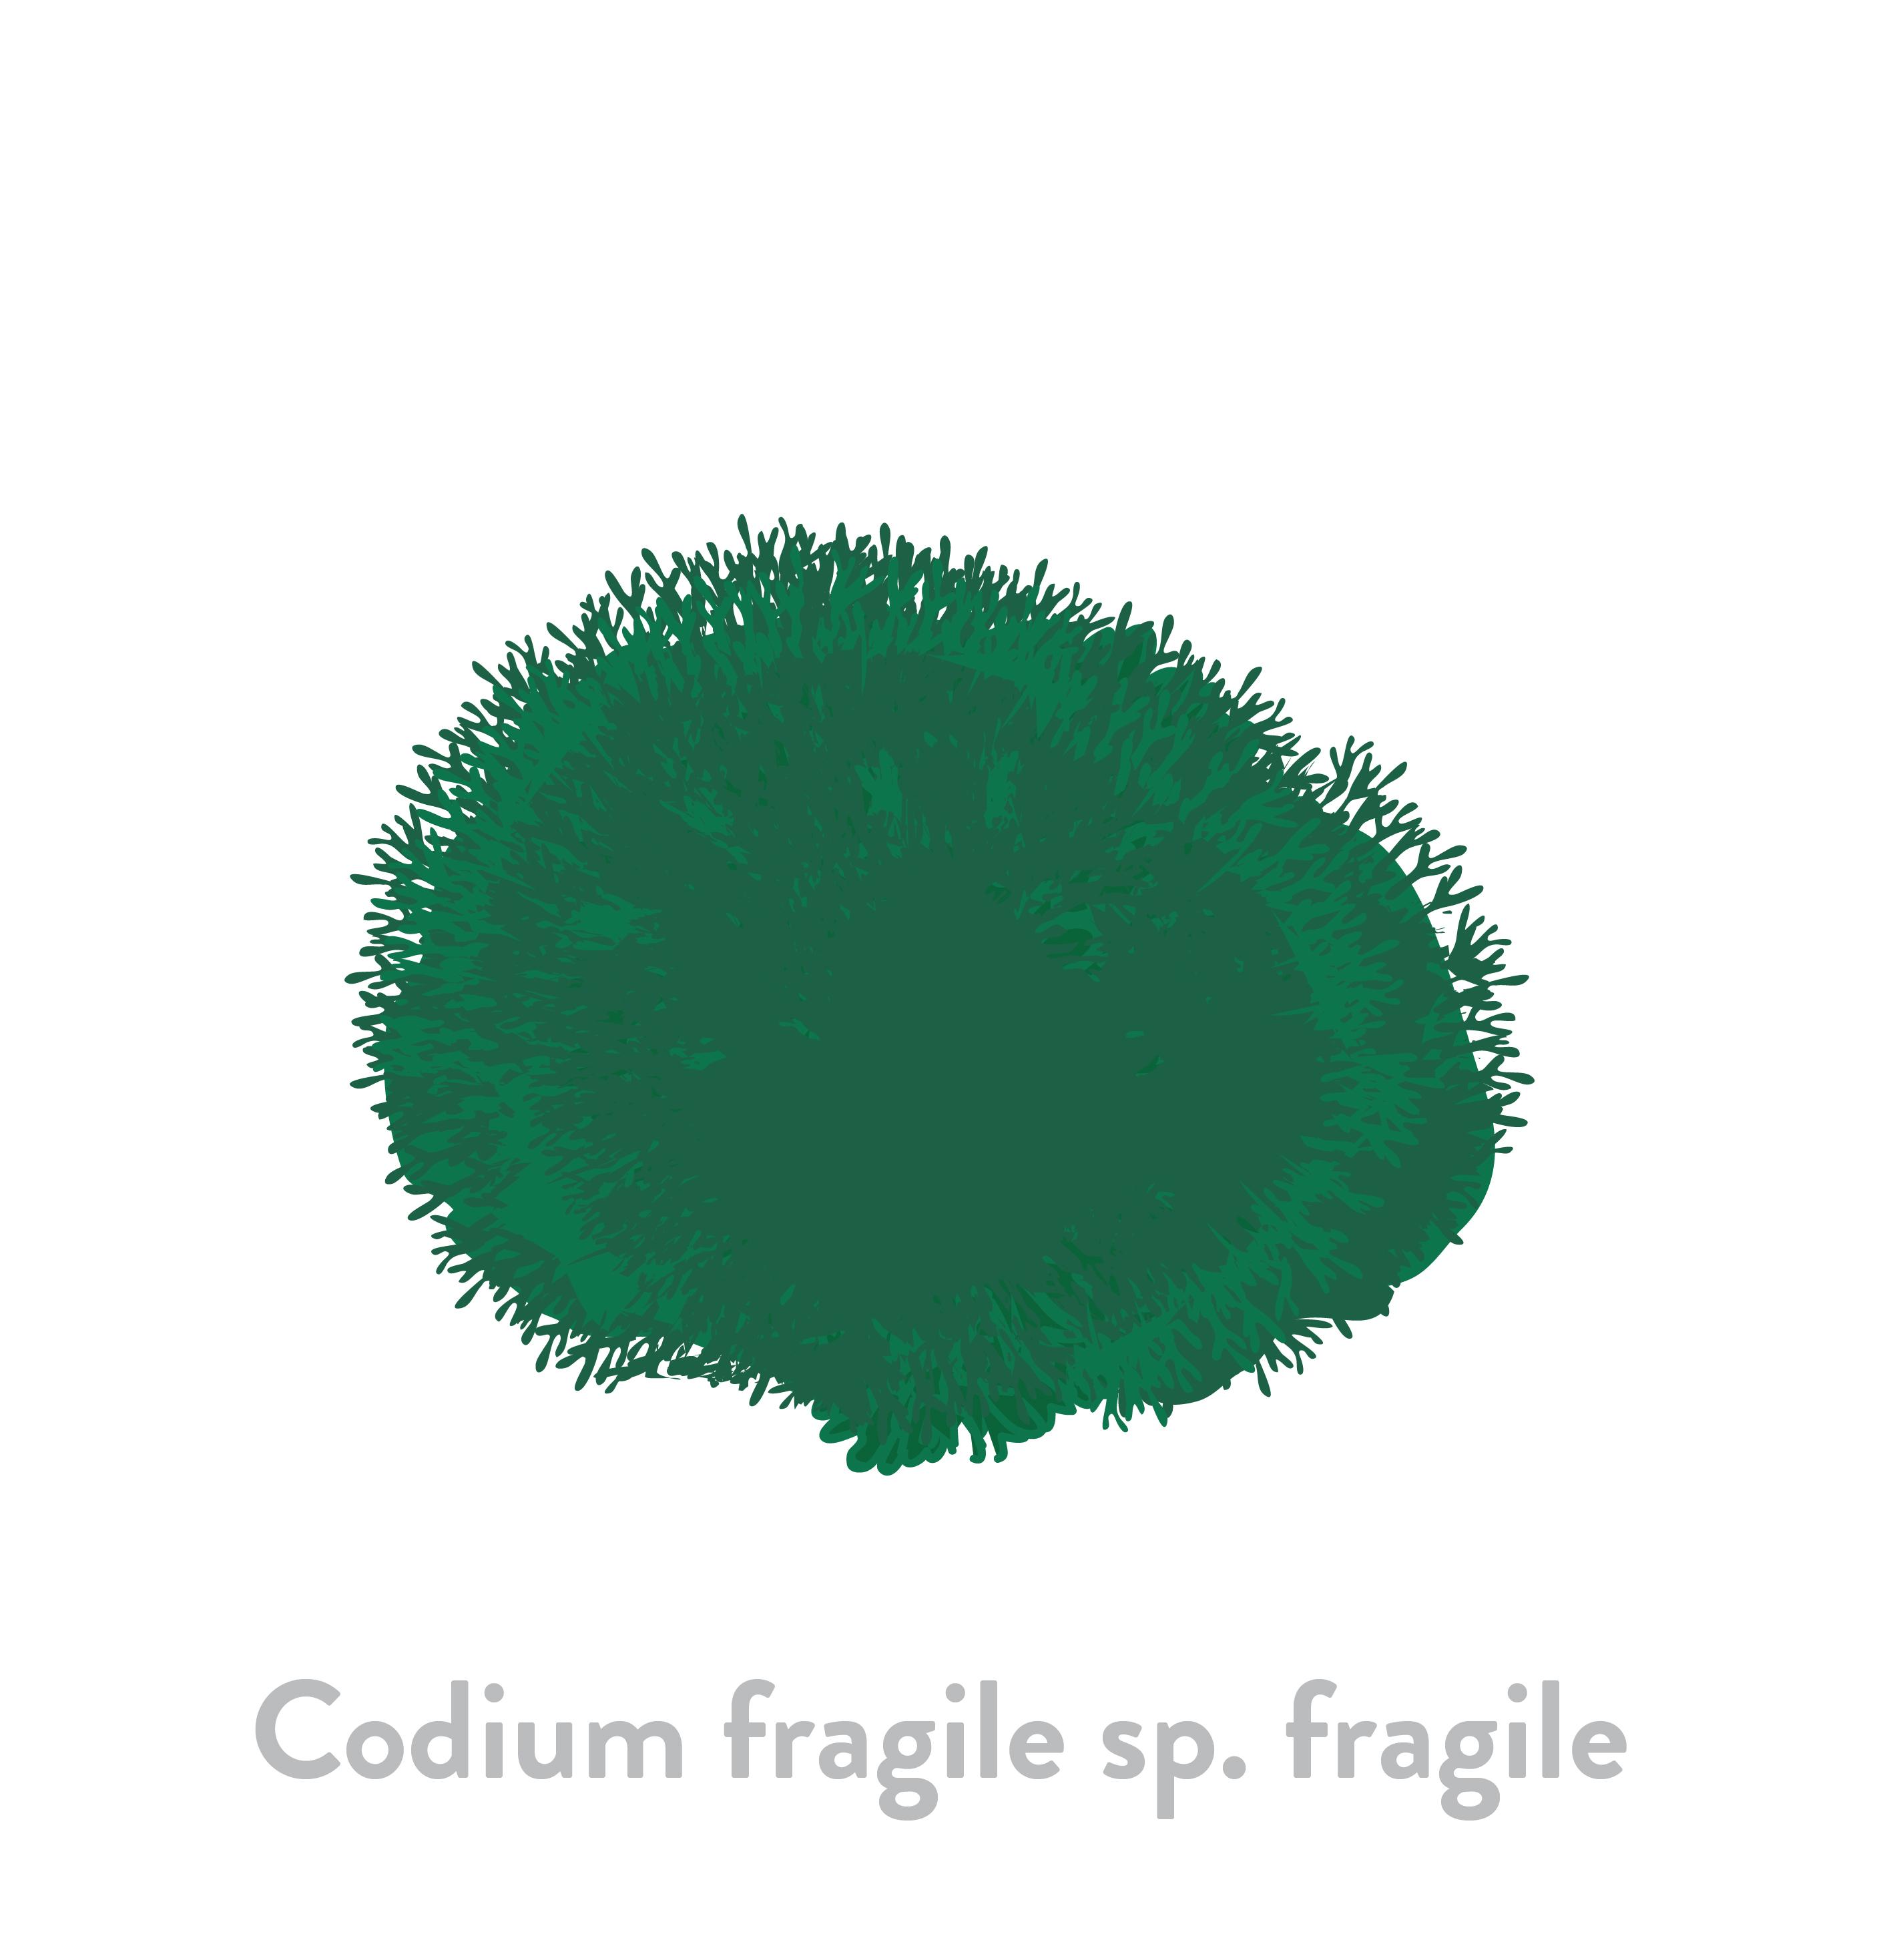 Codium fragile sp. fragile